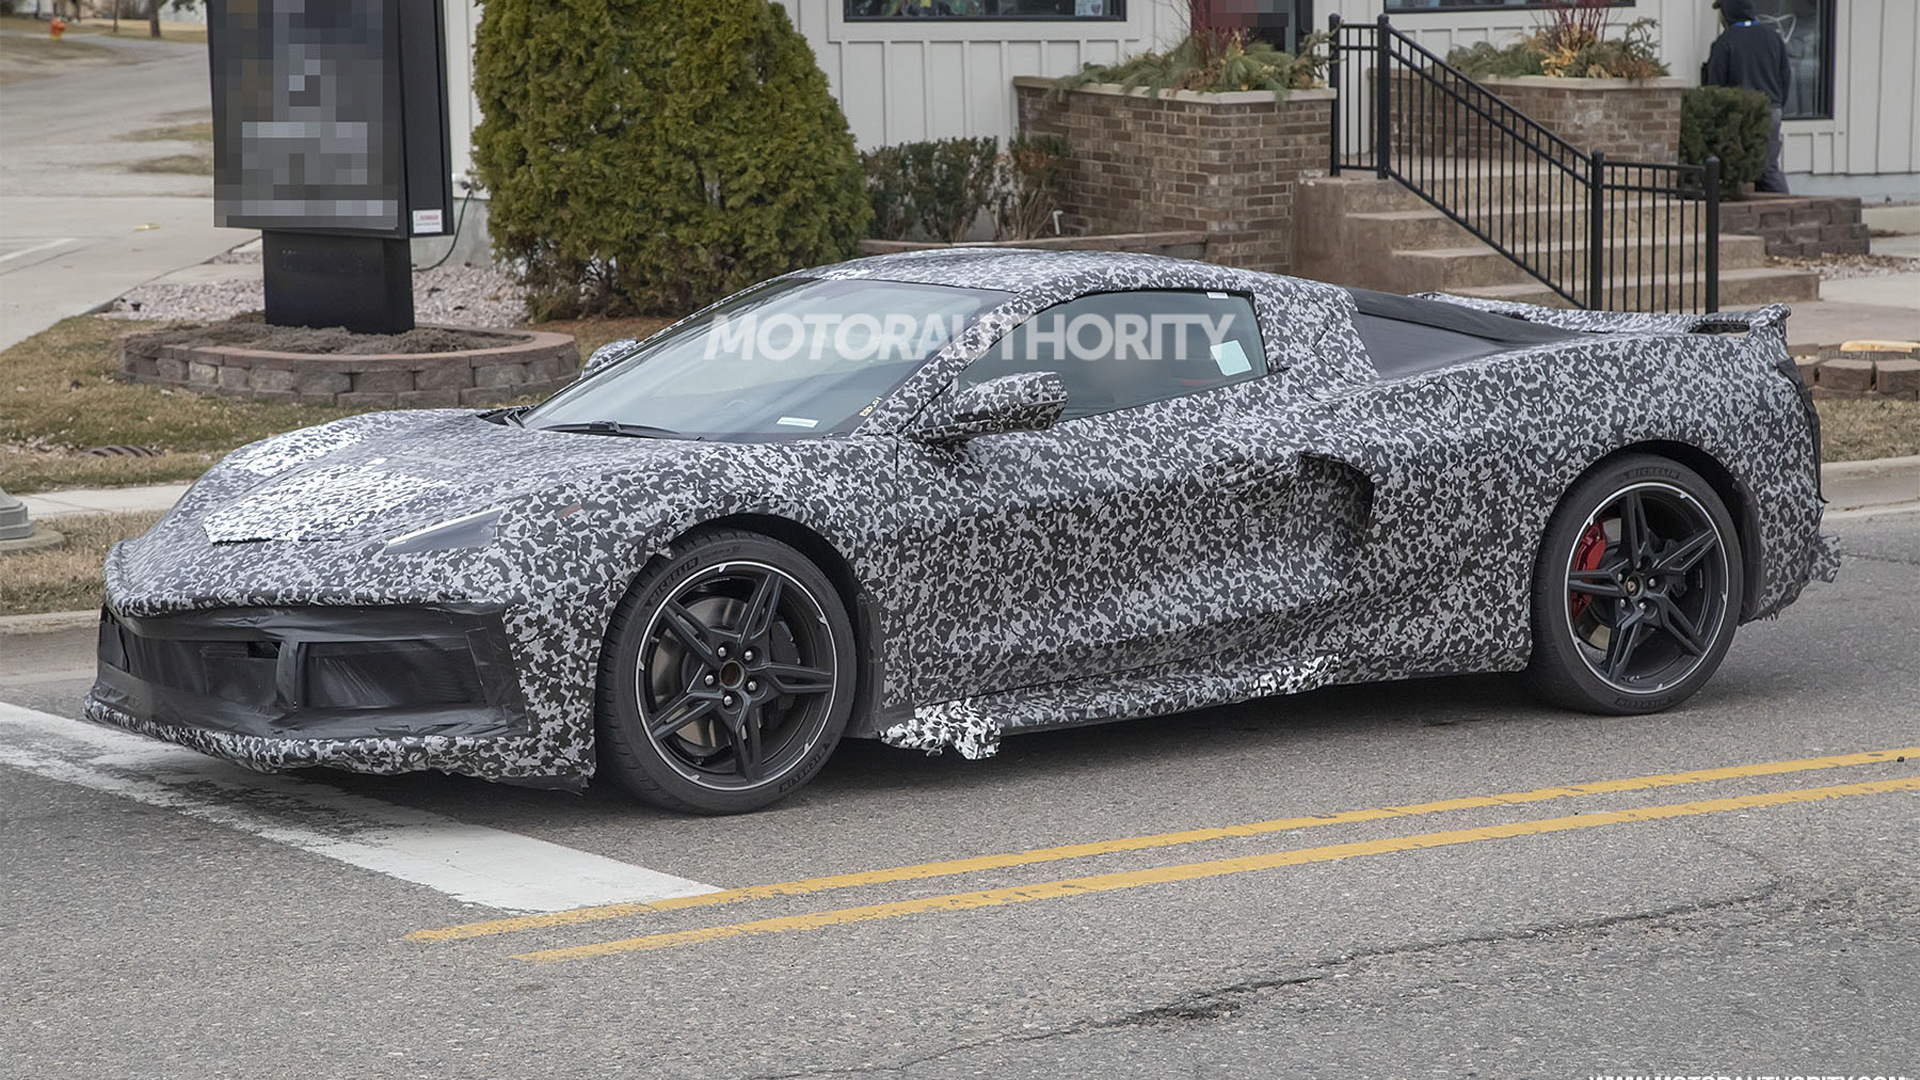 2020 Chevrolet Corvette (C8) spy shots and video